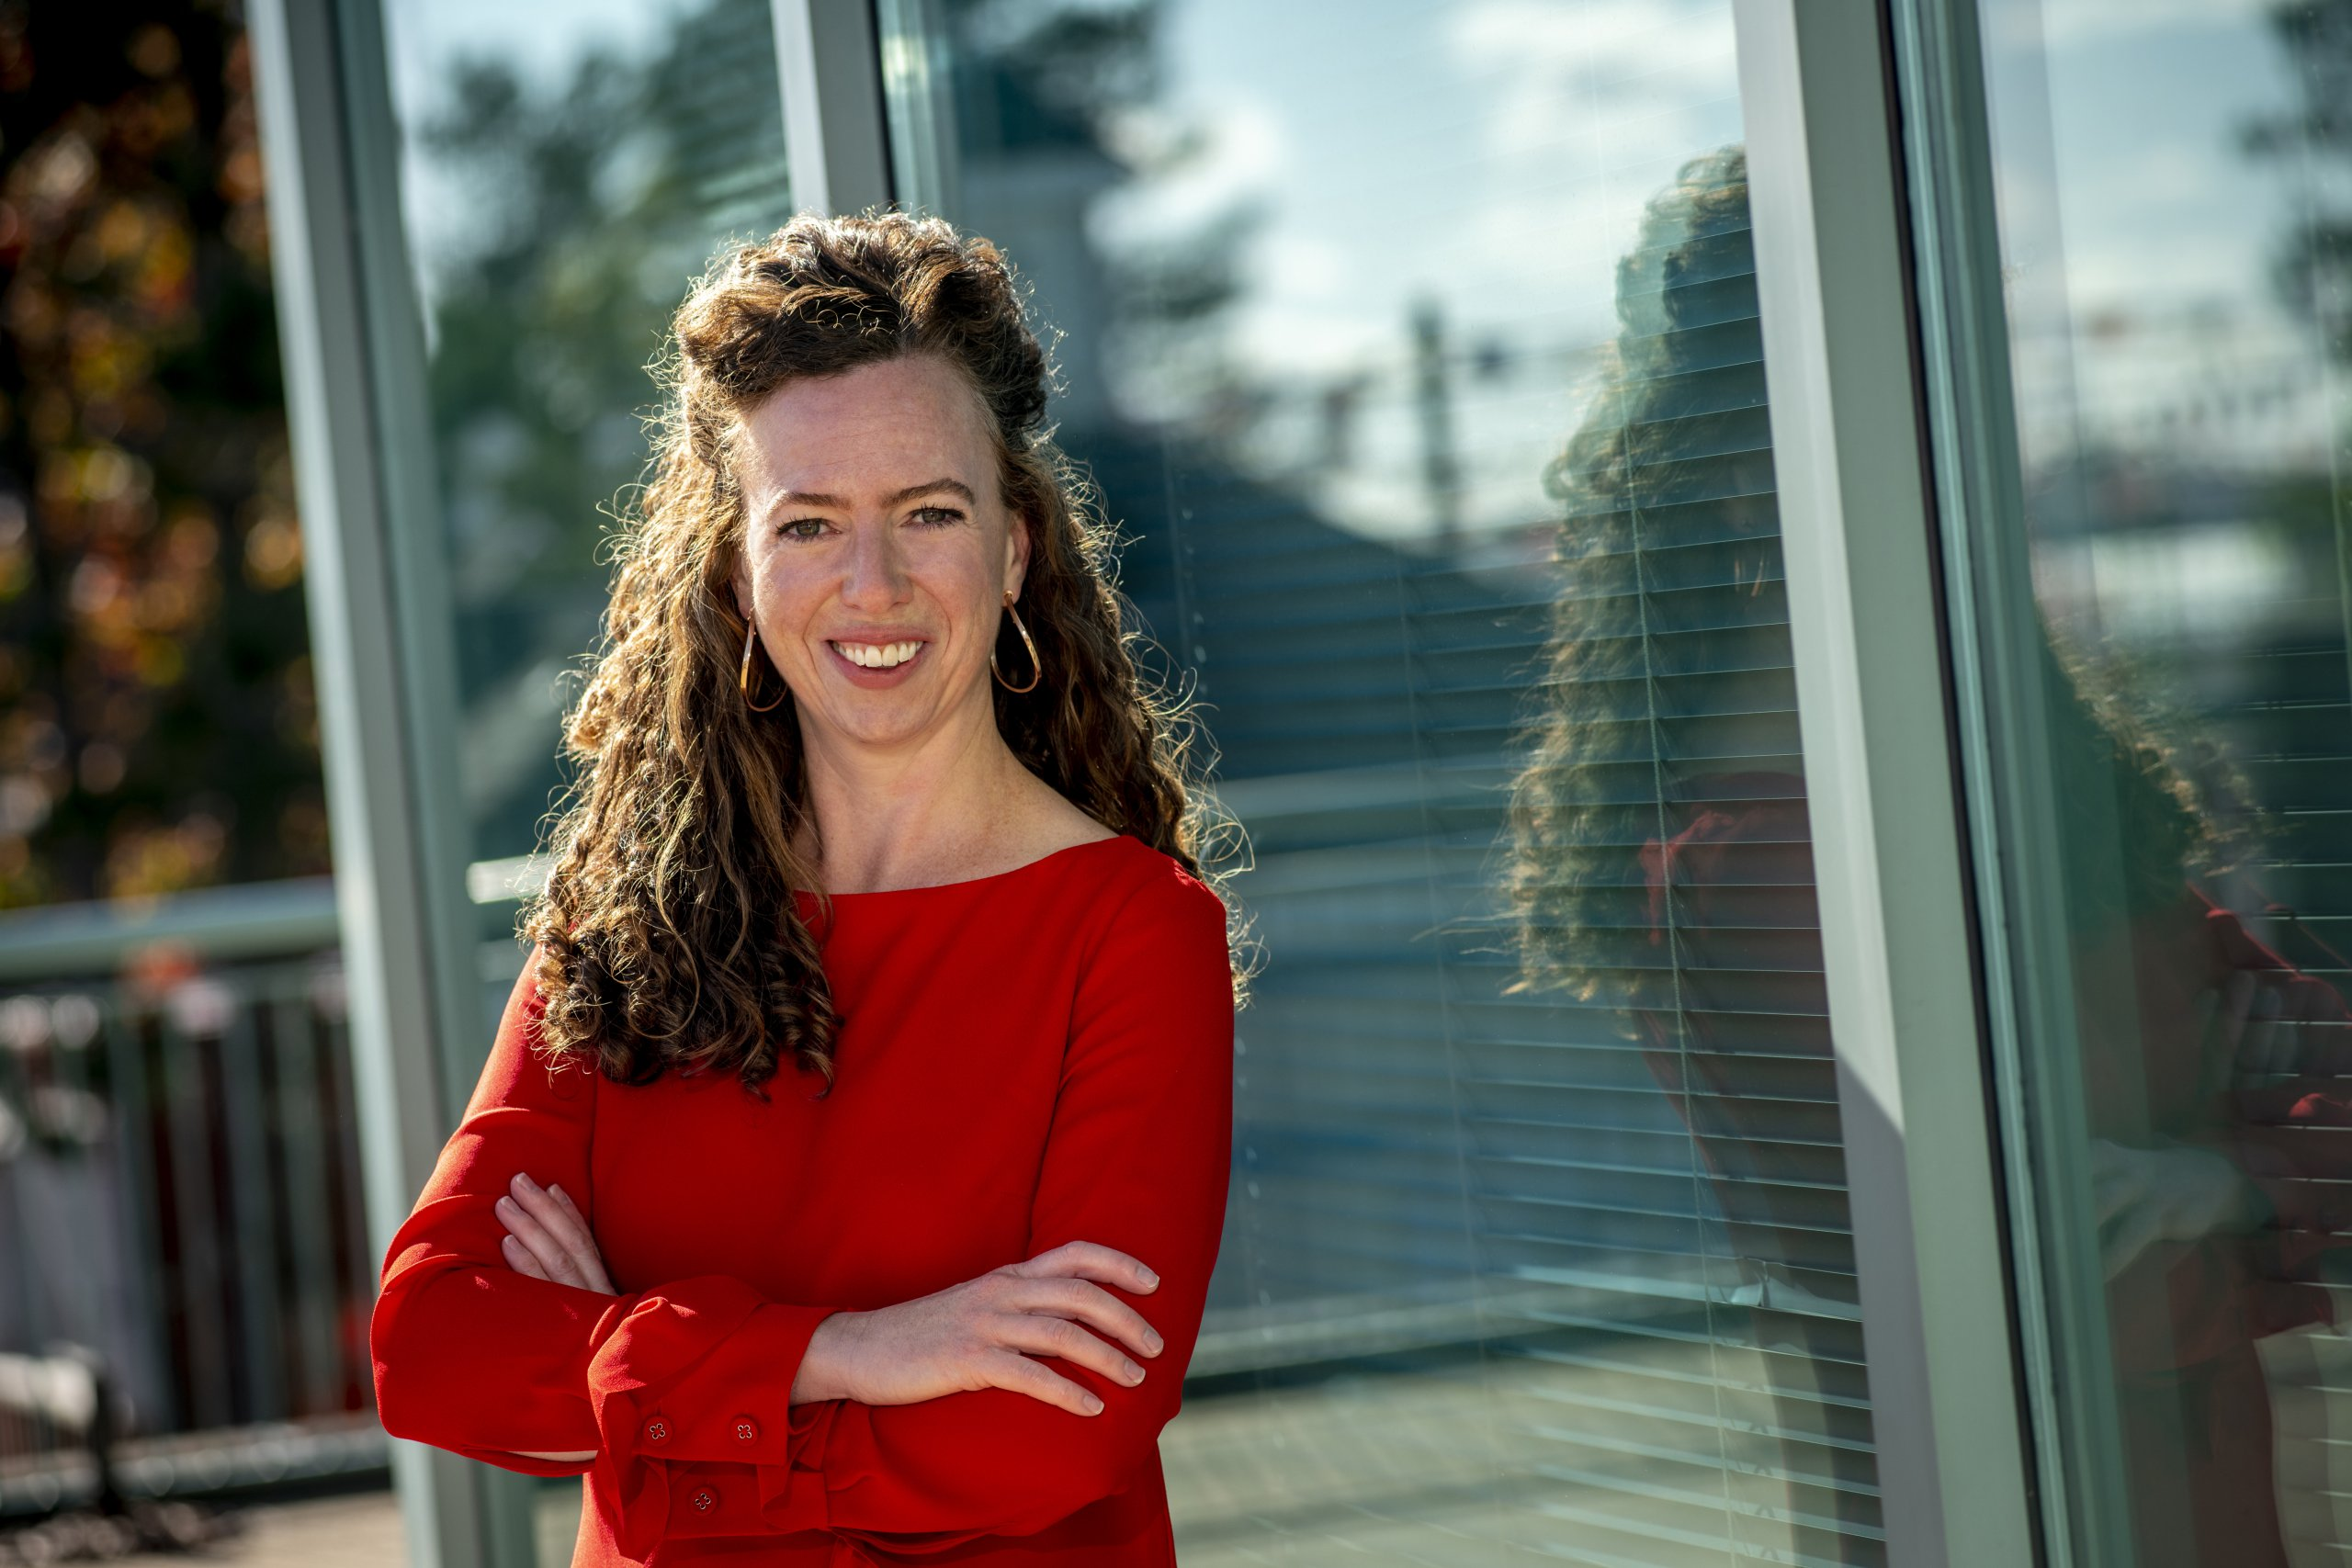 Joscelyn Duffy_CEO, The Maven Agency and leadership ghostwriter